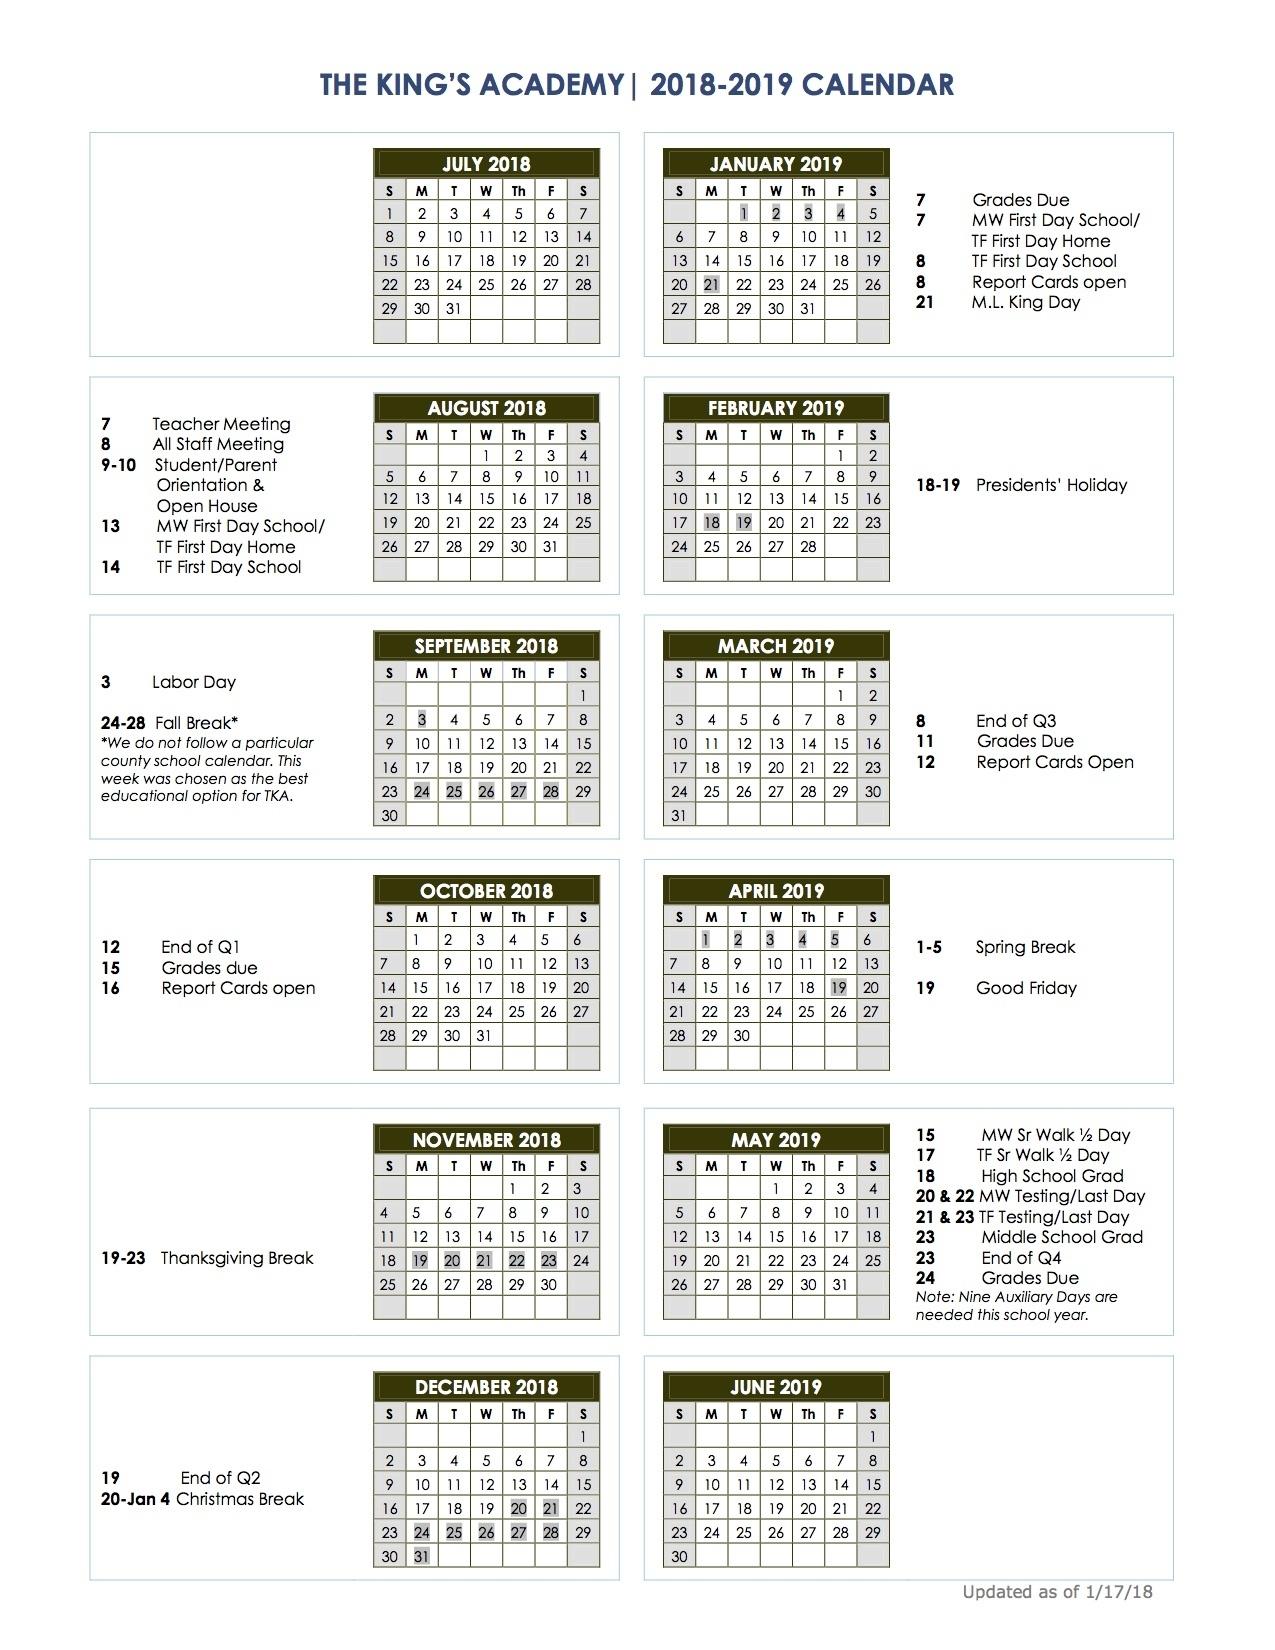 2018-2019 School Calendar - The King's Academy Impressive School Calendar Vancouver Wa